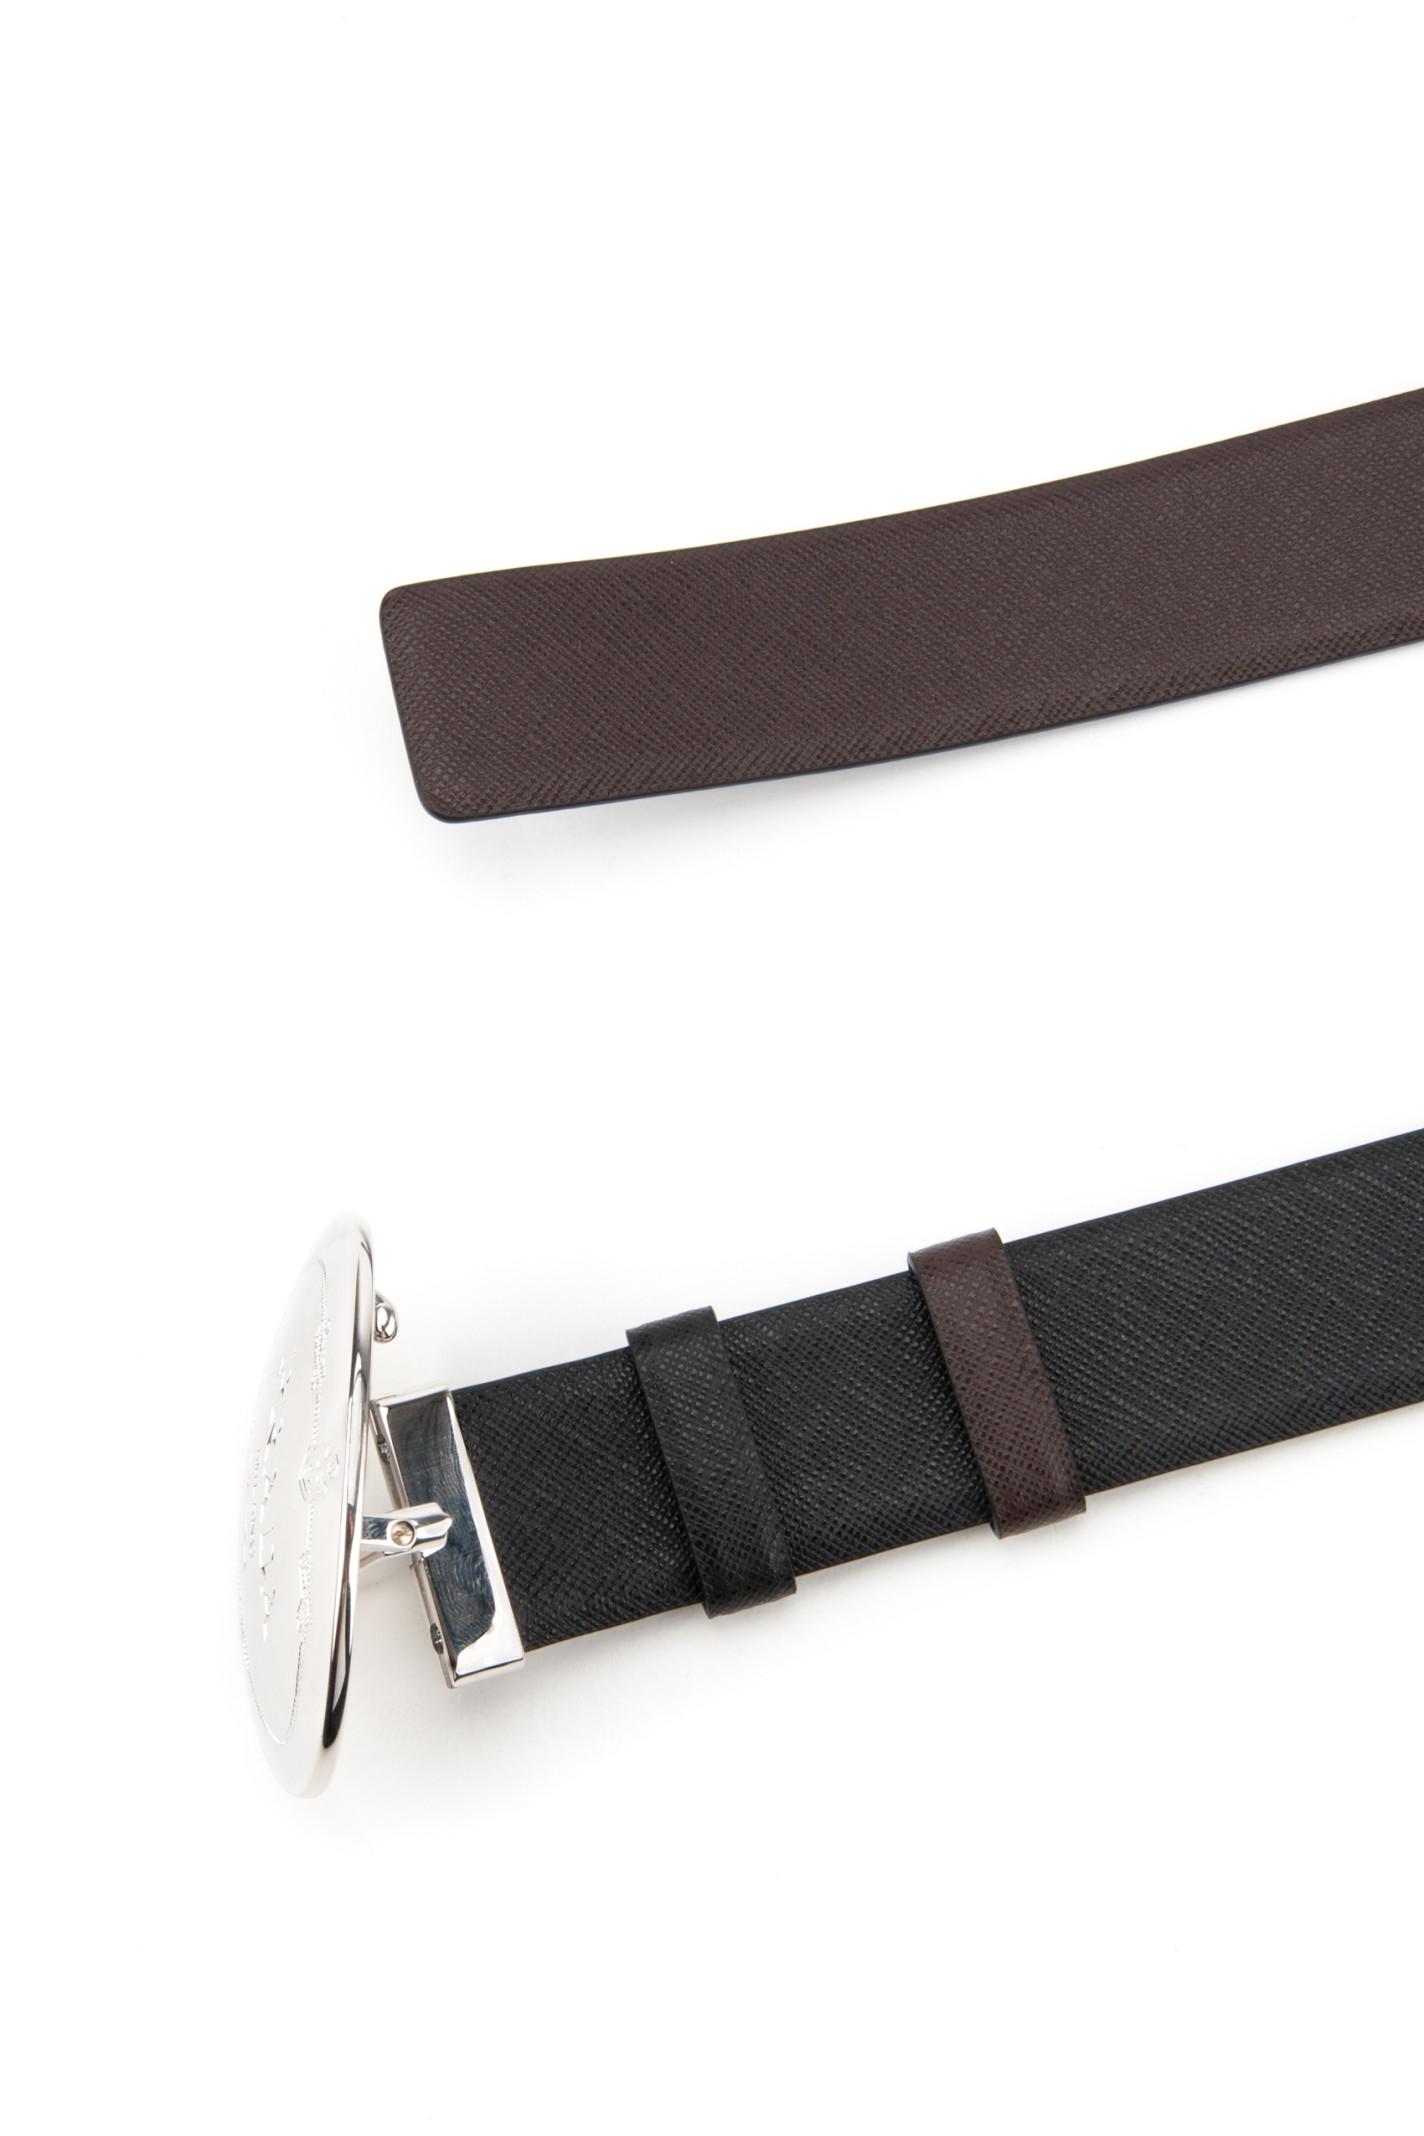 prada small bag nylon - Prada Saffiano Belt in Black for Men (NERO+CAFF��) | Lyst